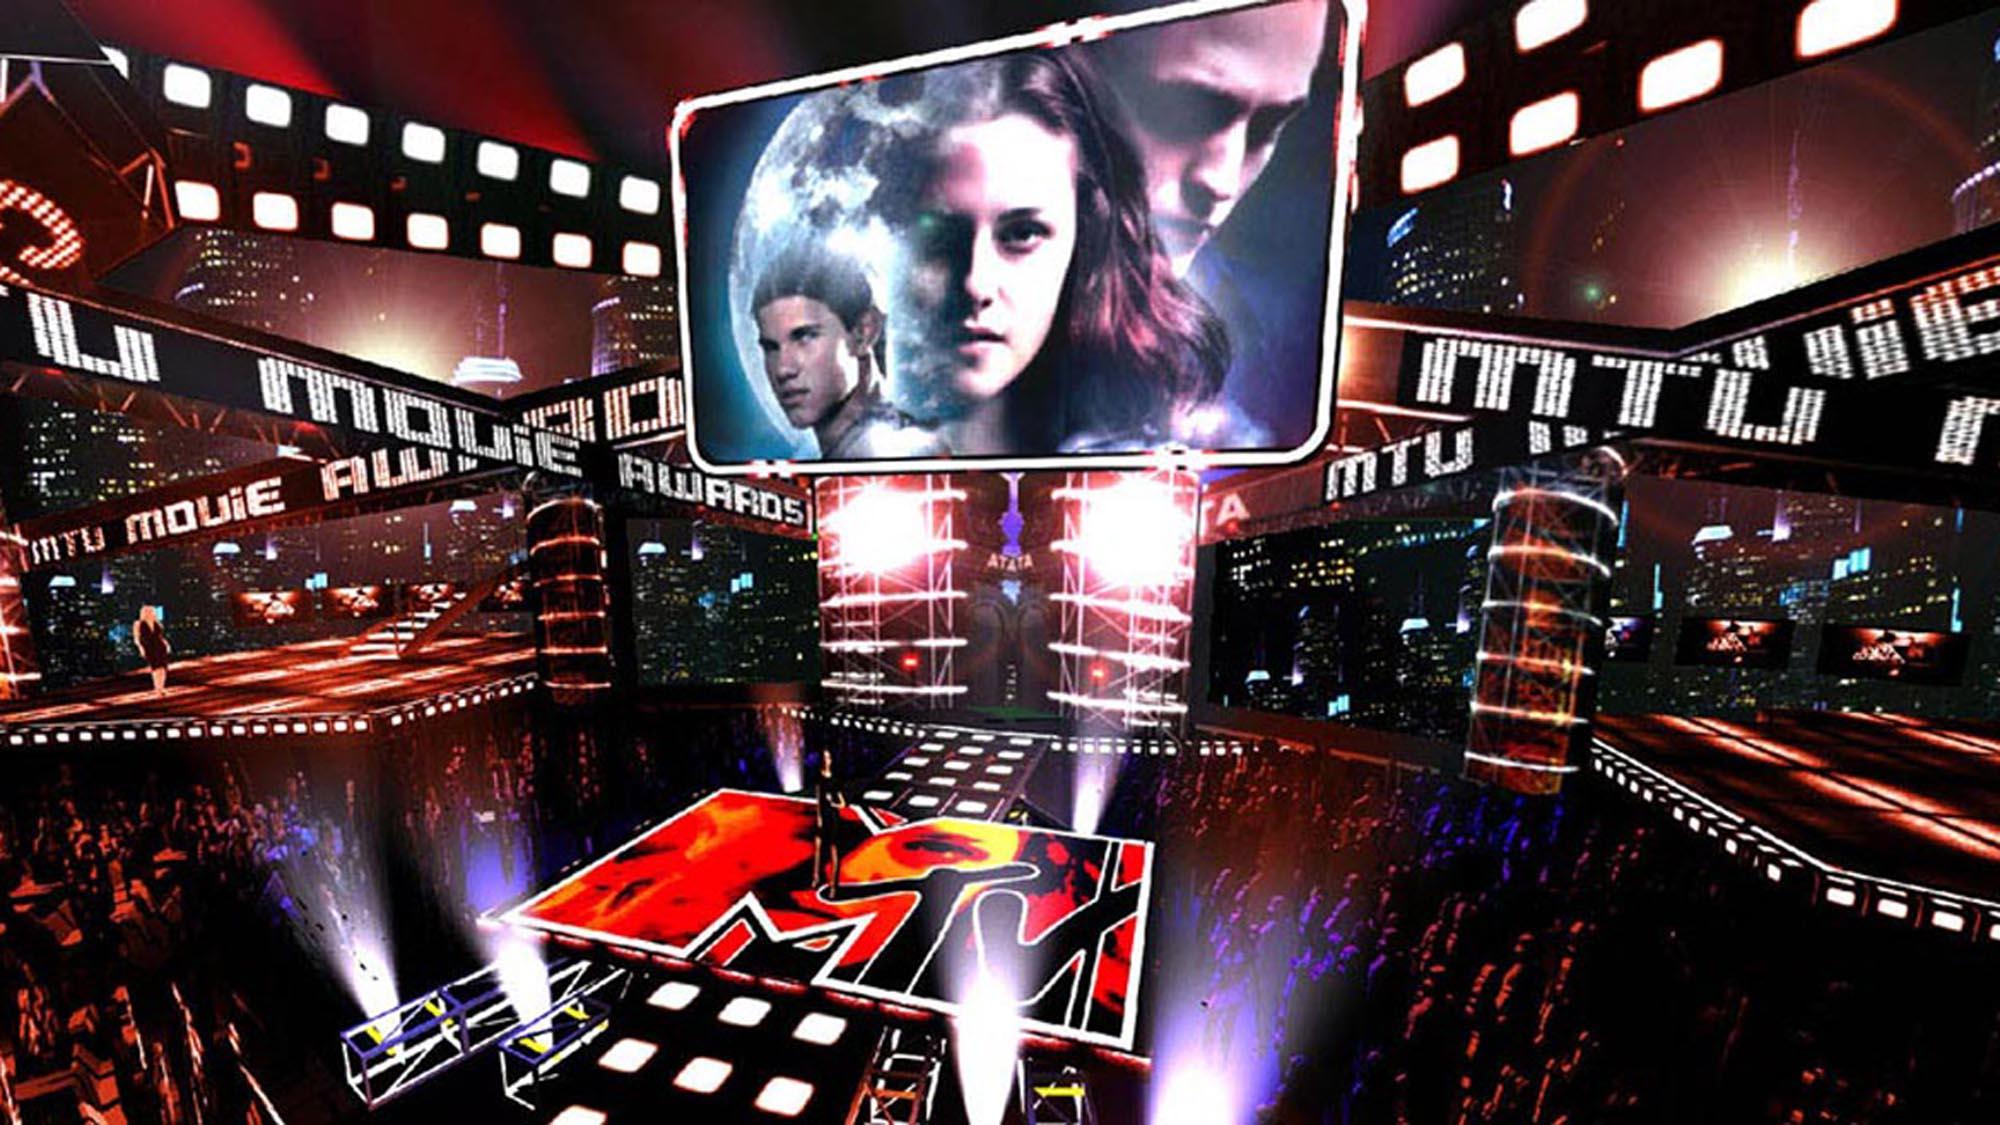 movie-10-04-smsized